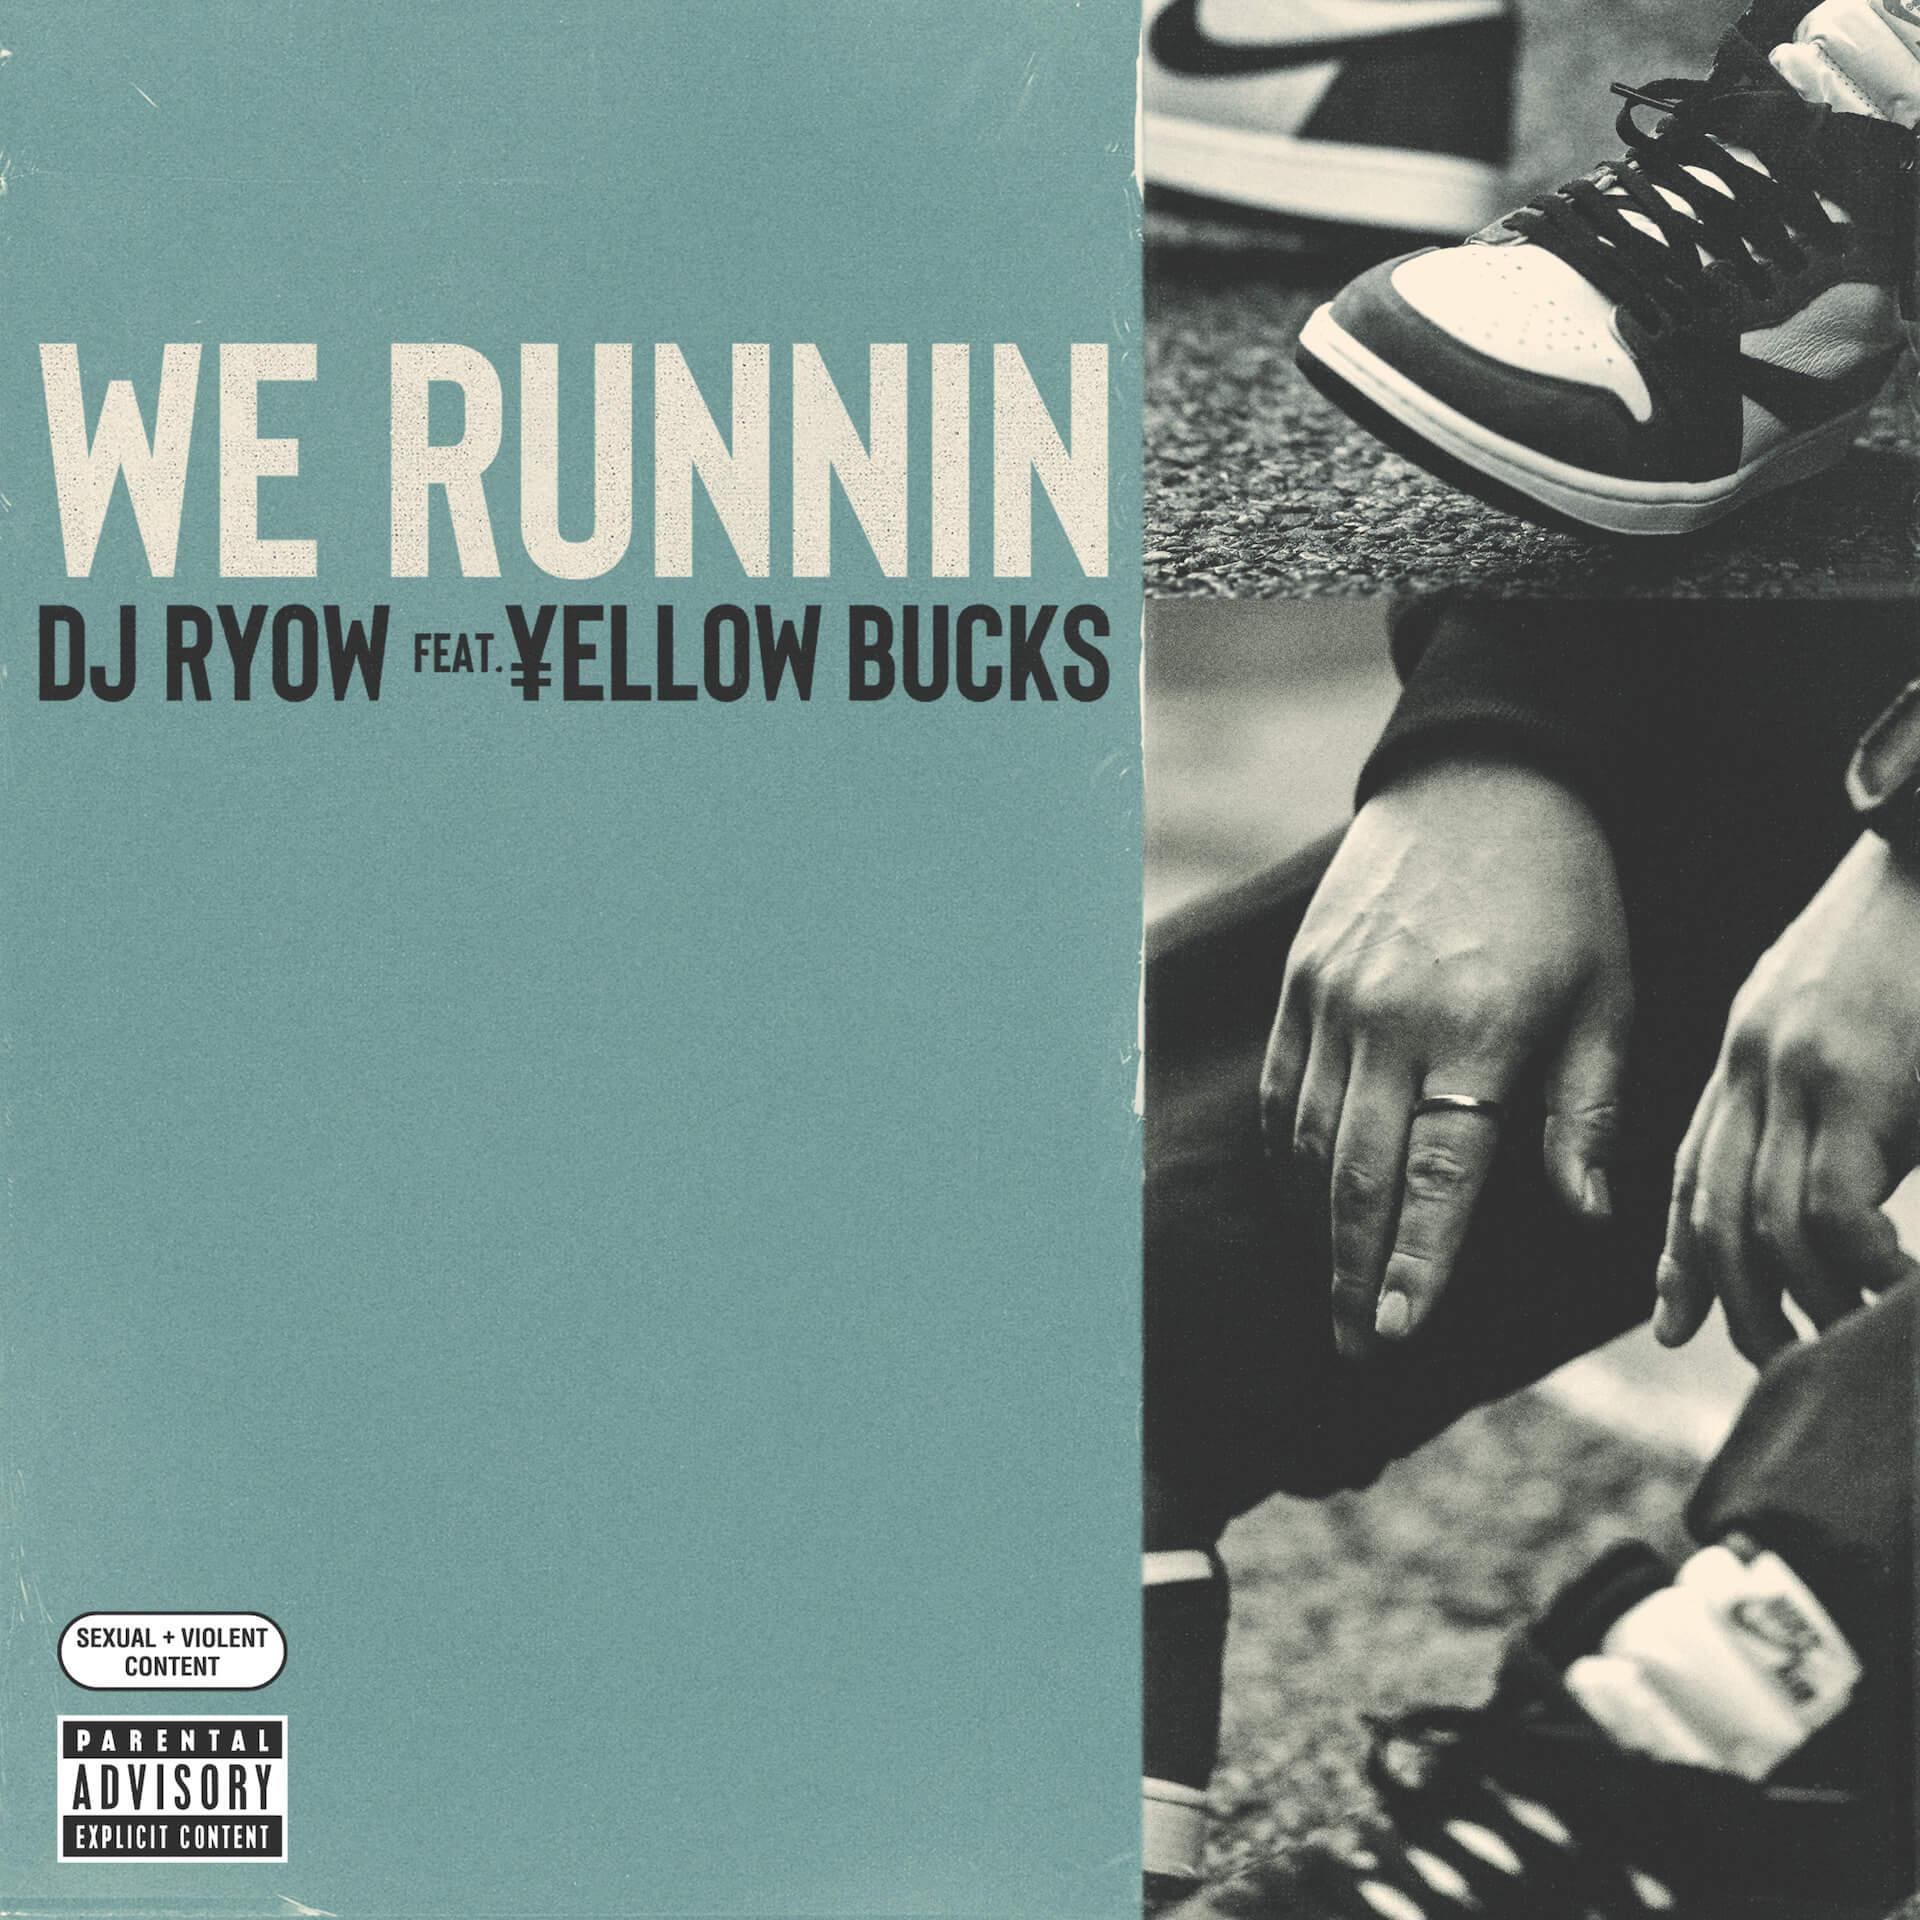 DJ RYOW新アルバムから「We Runnin feat. ¥ELLOW BUCKS」を先行配信|話題のMVも公開 music190904djryow_3